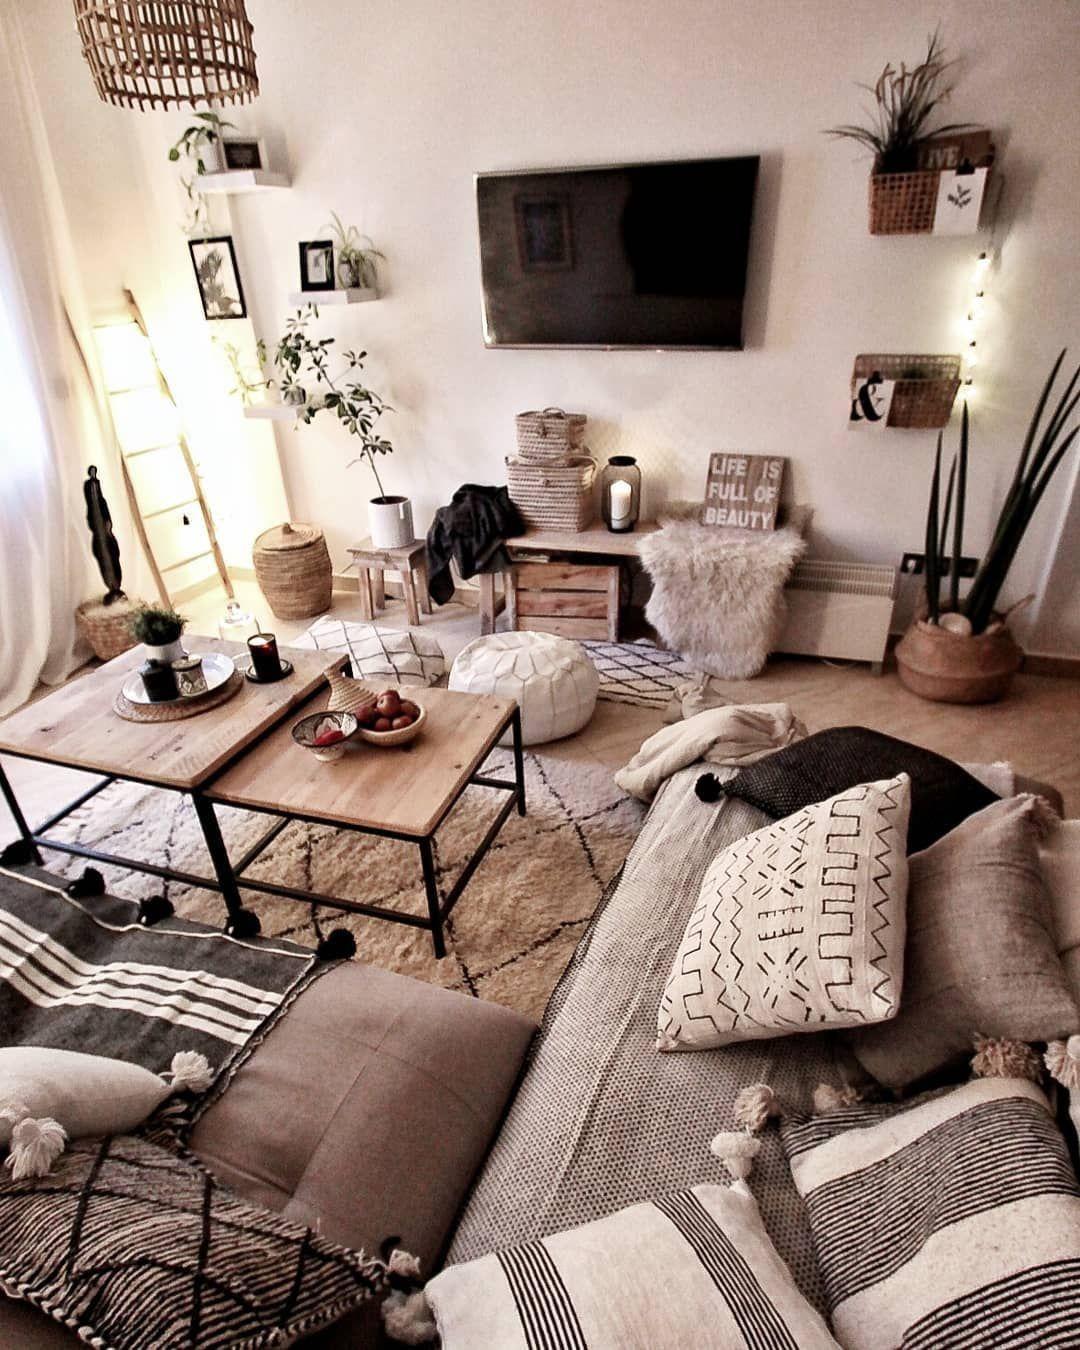 Decoration Salon Instagram 2021 Living Room Decor Room Decor Living Room Interior Living room decorations 2021